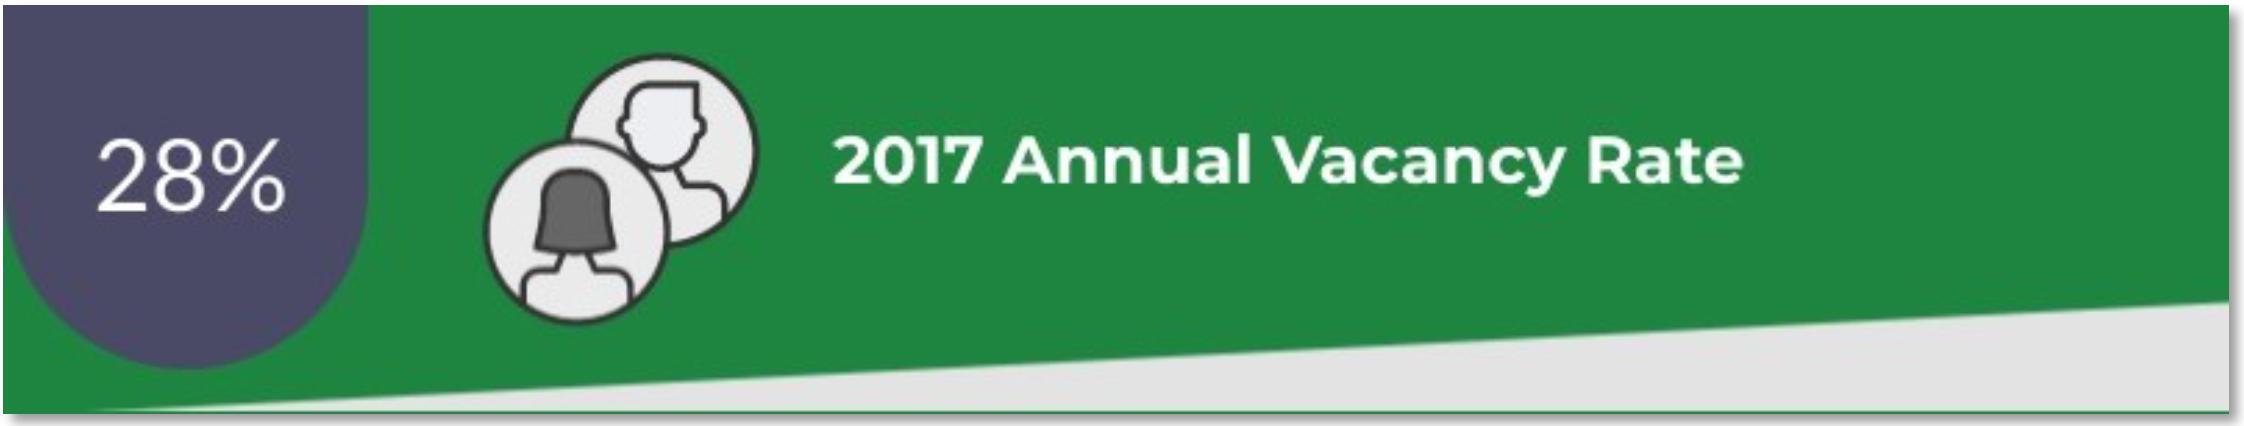 EBCI Annual Vacancy Rate: 28%